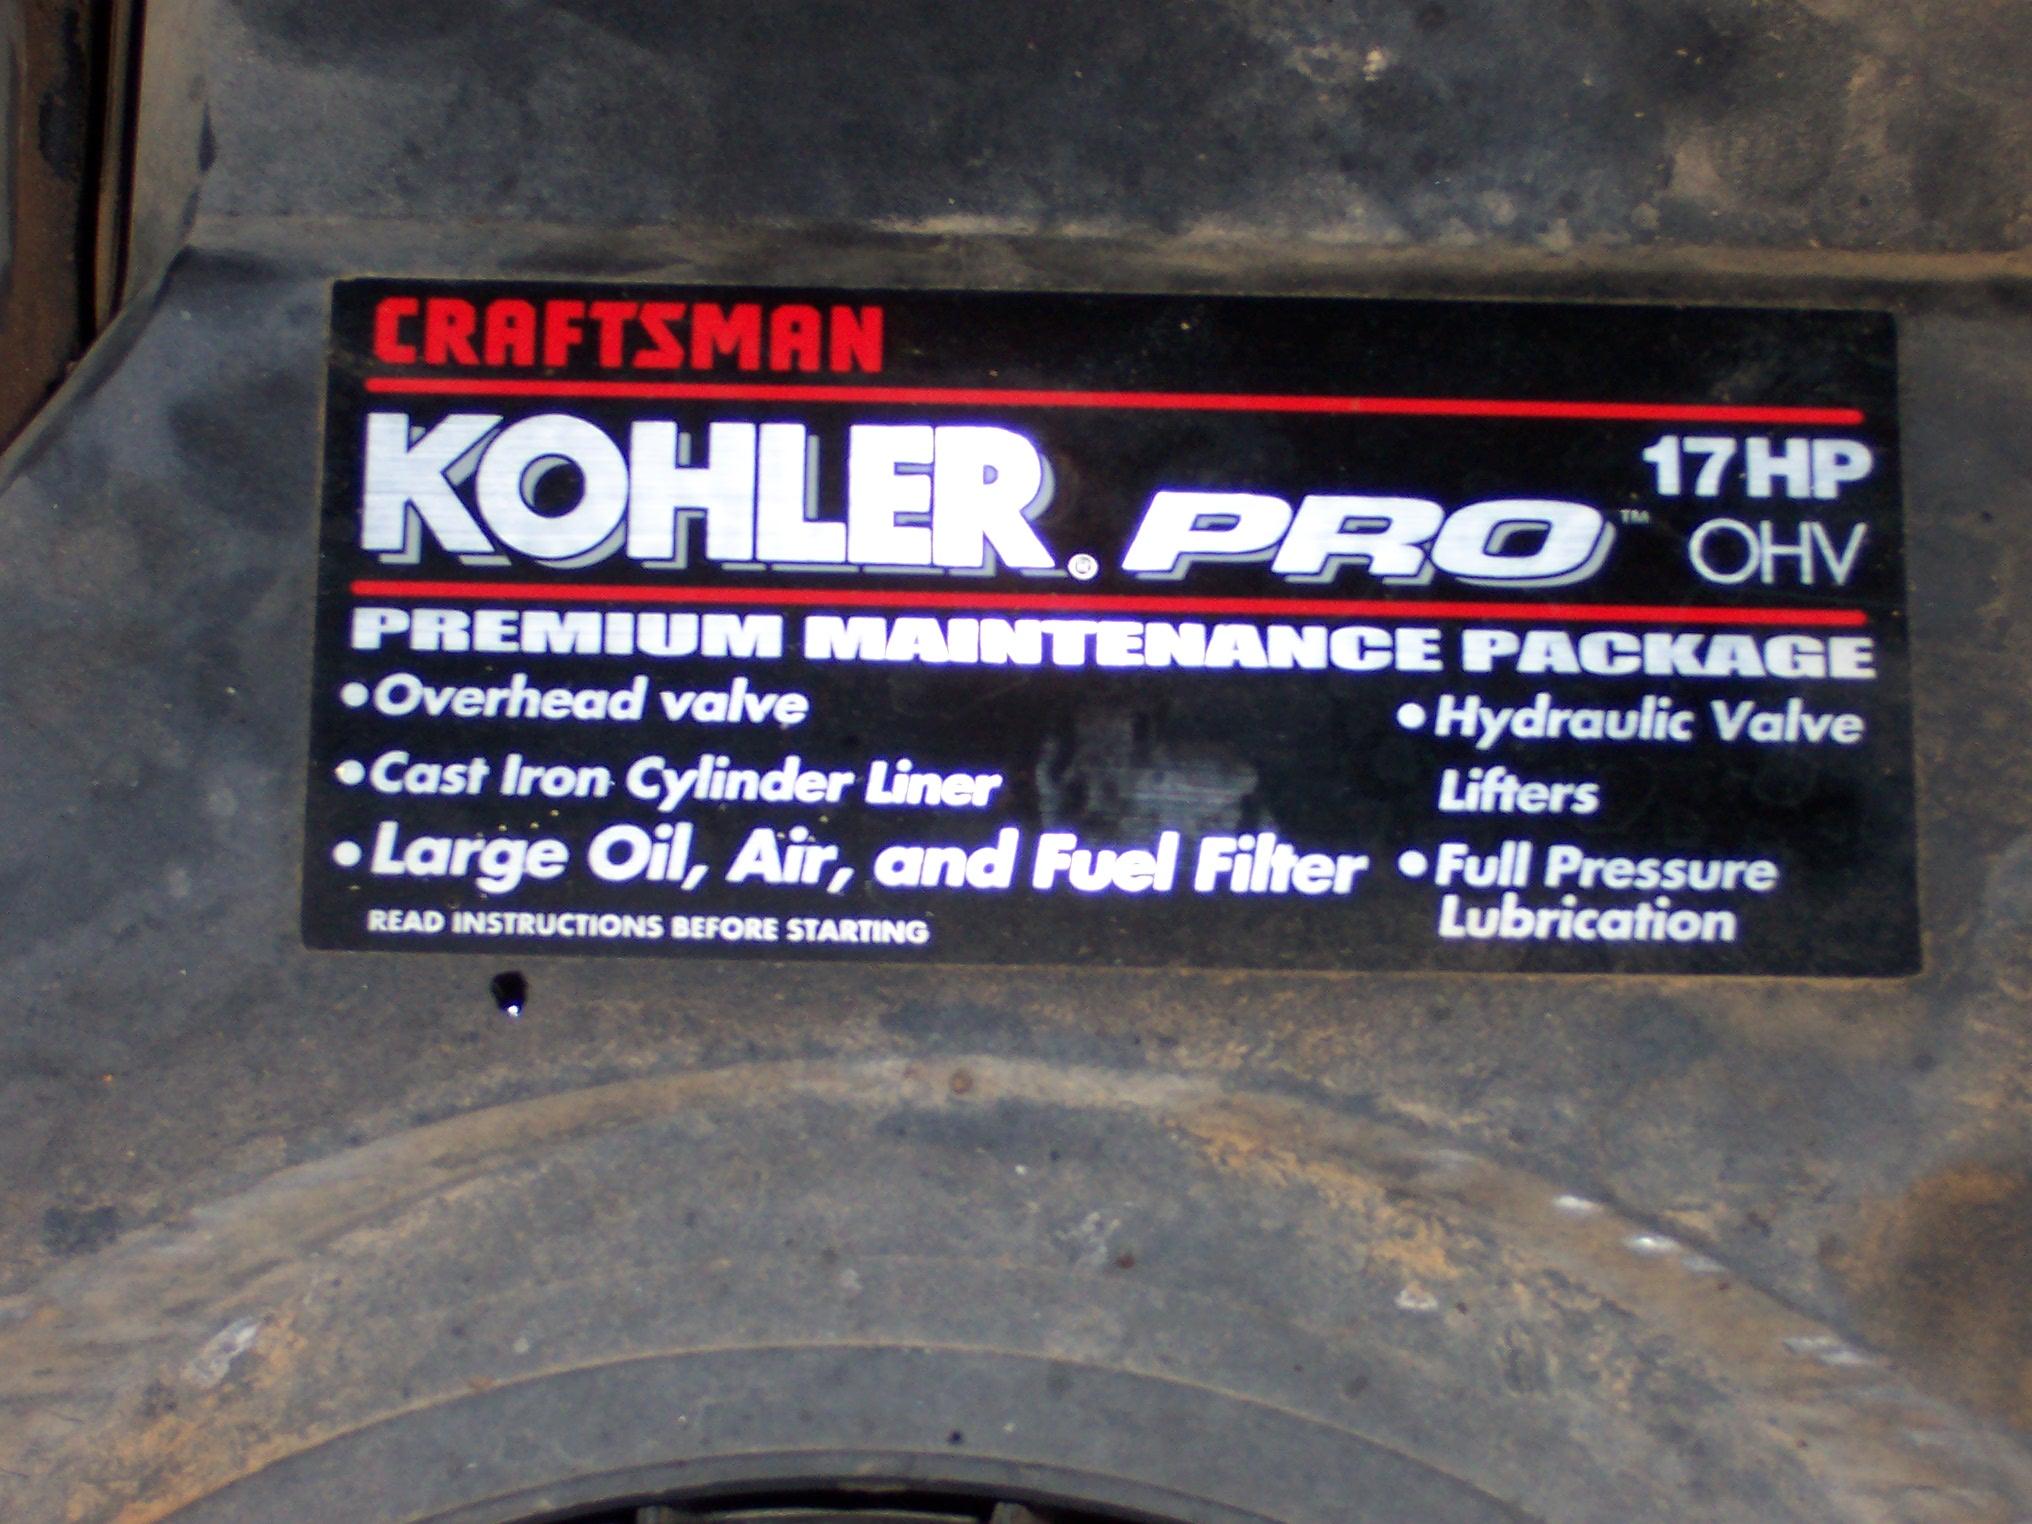 Craigslist LT2000, Blown Kohler - MyTractorForum com - The